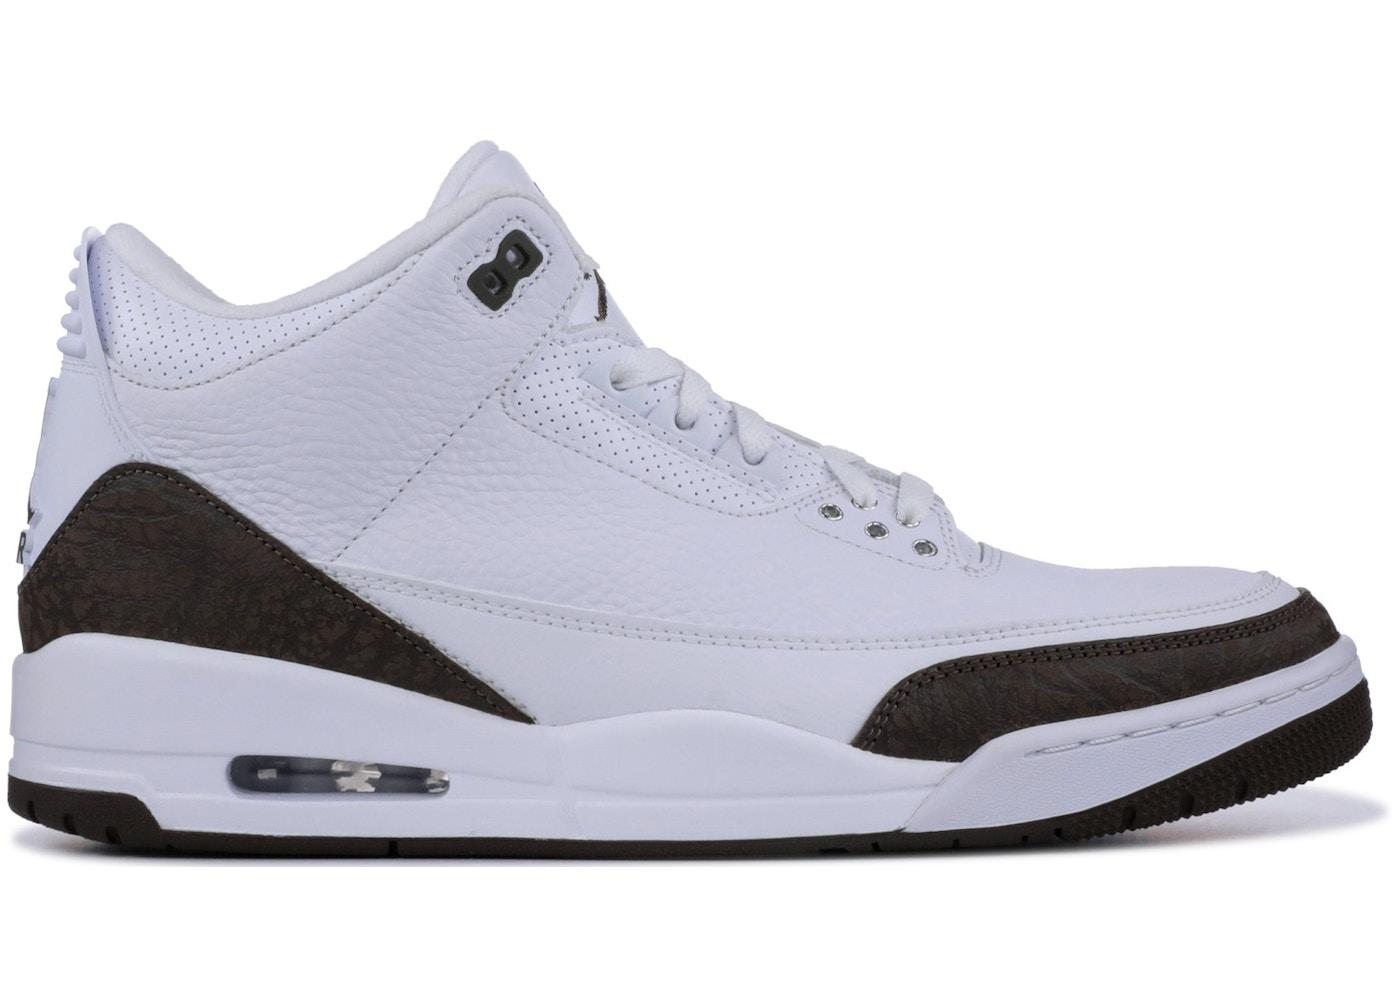 2e81897e360f89 Buy Air Jordan 3 Shoes   Deadstock Sneakers